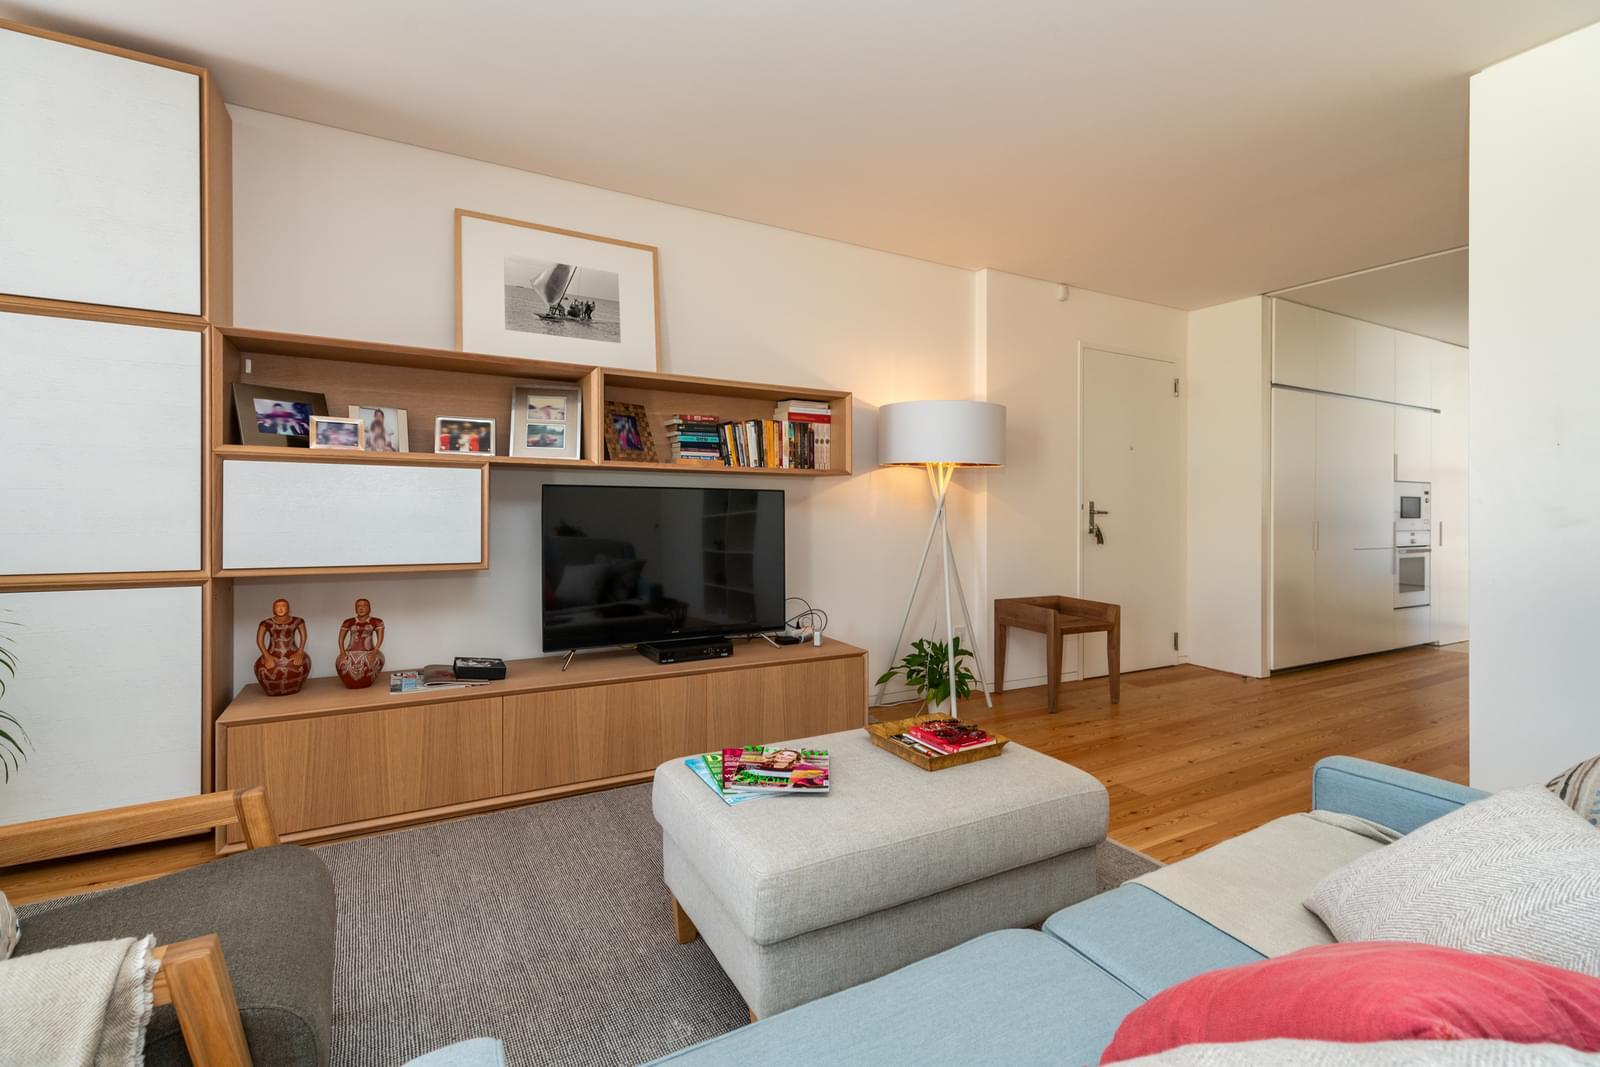 pf19126-apartamento-t2-lisboa-2ab102e9-e481-400c-be9c-c624e8a9f2b4